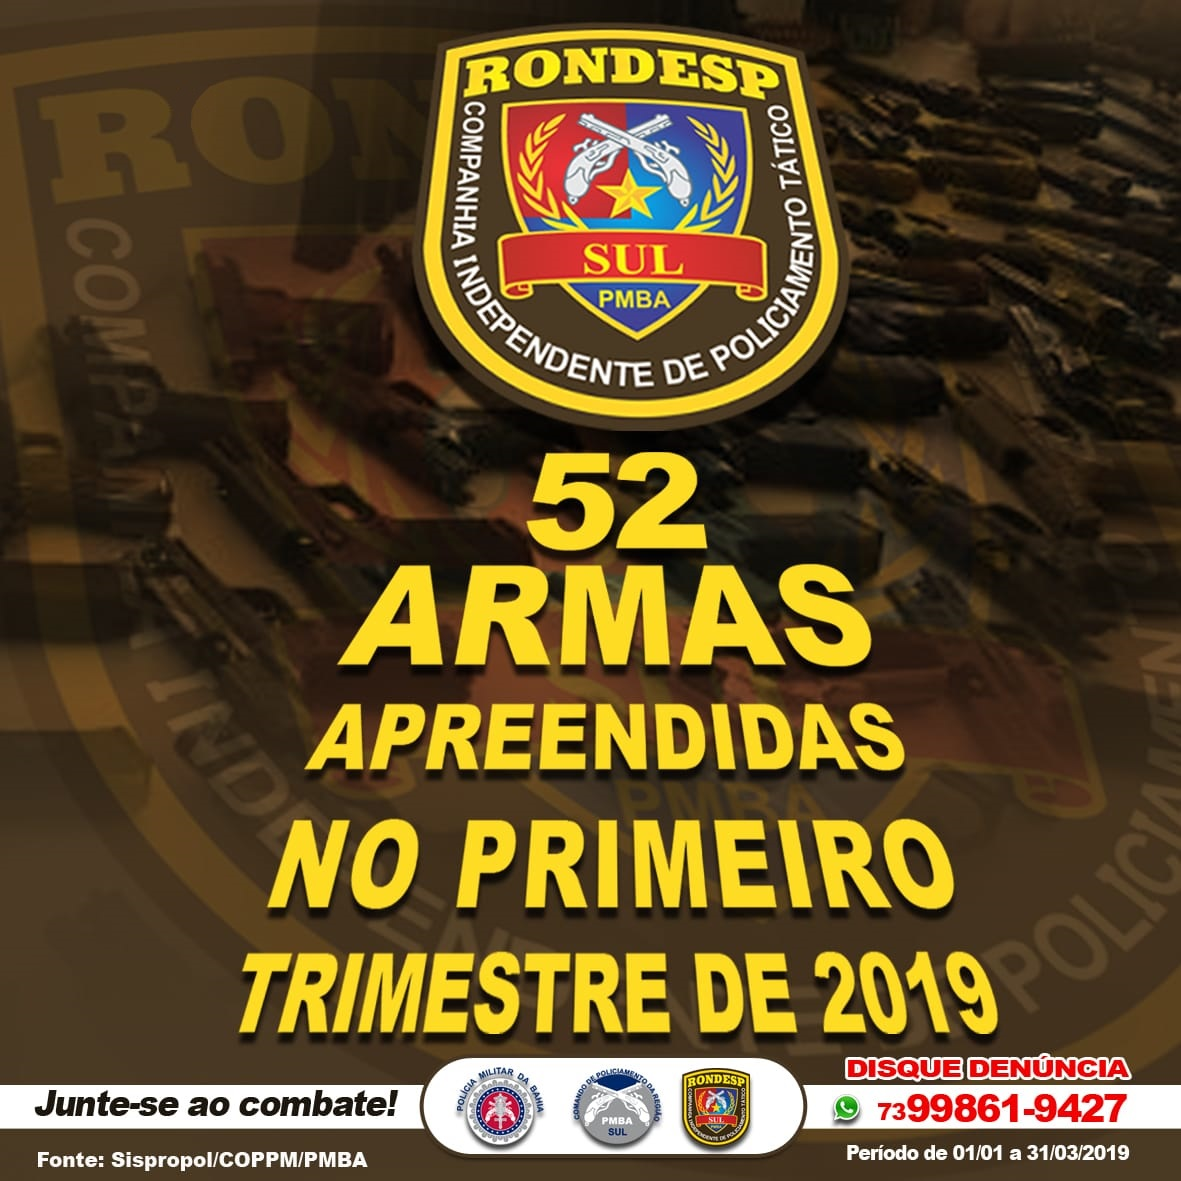 PMBA/CPRS/CIPT-SUL  -  RONDESP SUL APRESENTA DADOS ESTATÍSTICOS DO PRIMEIRO TRIMESTRE DE 2019. 1